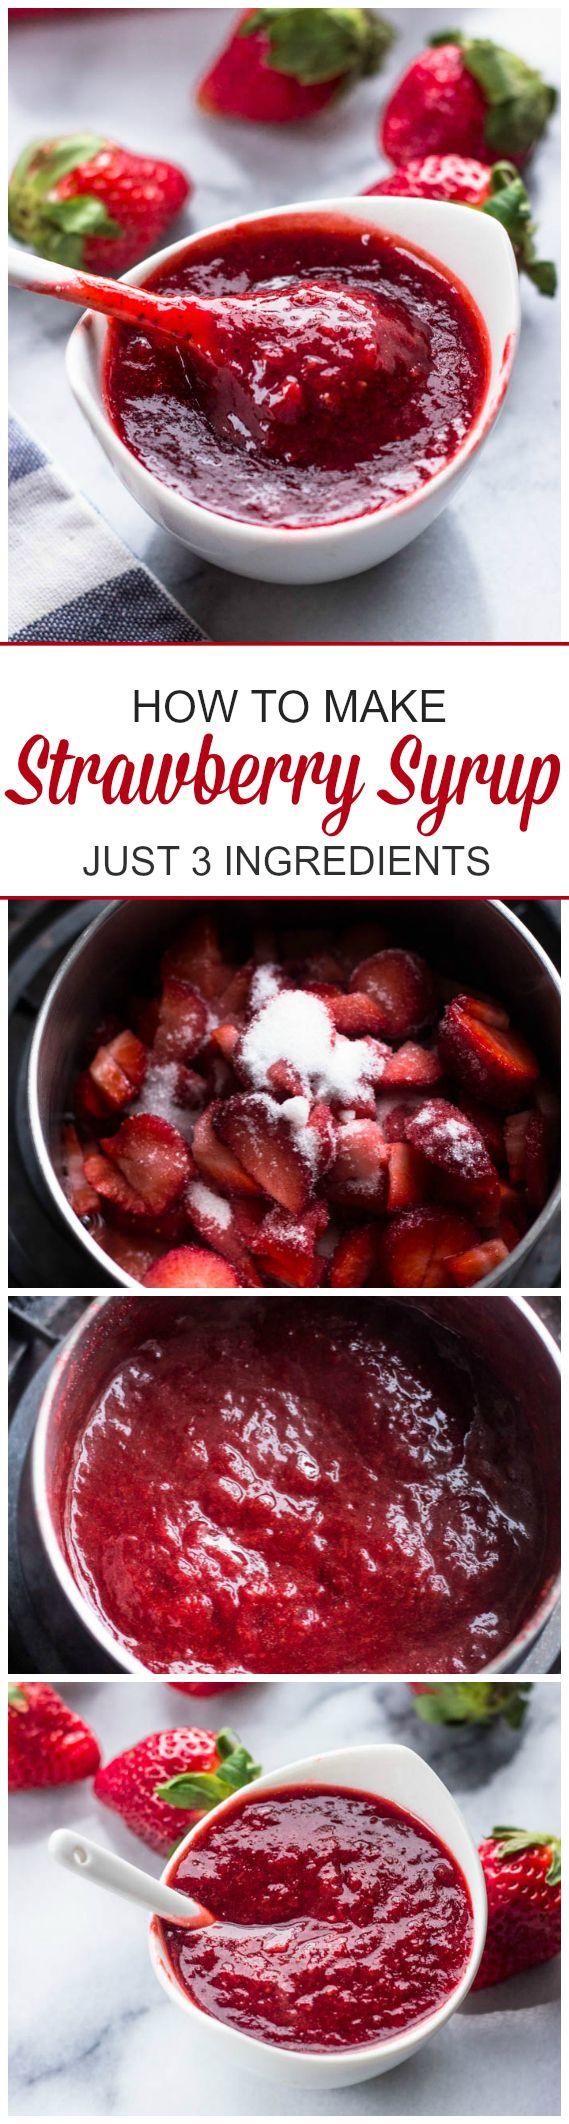 Homemade Strawberry Syrup (Sauce)